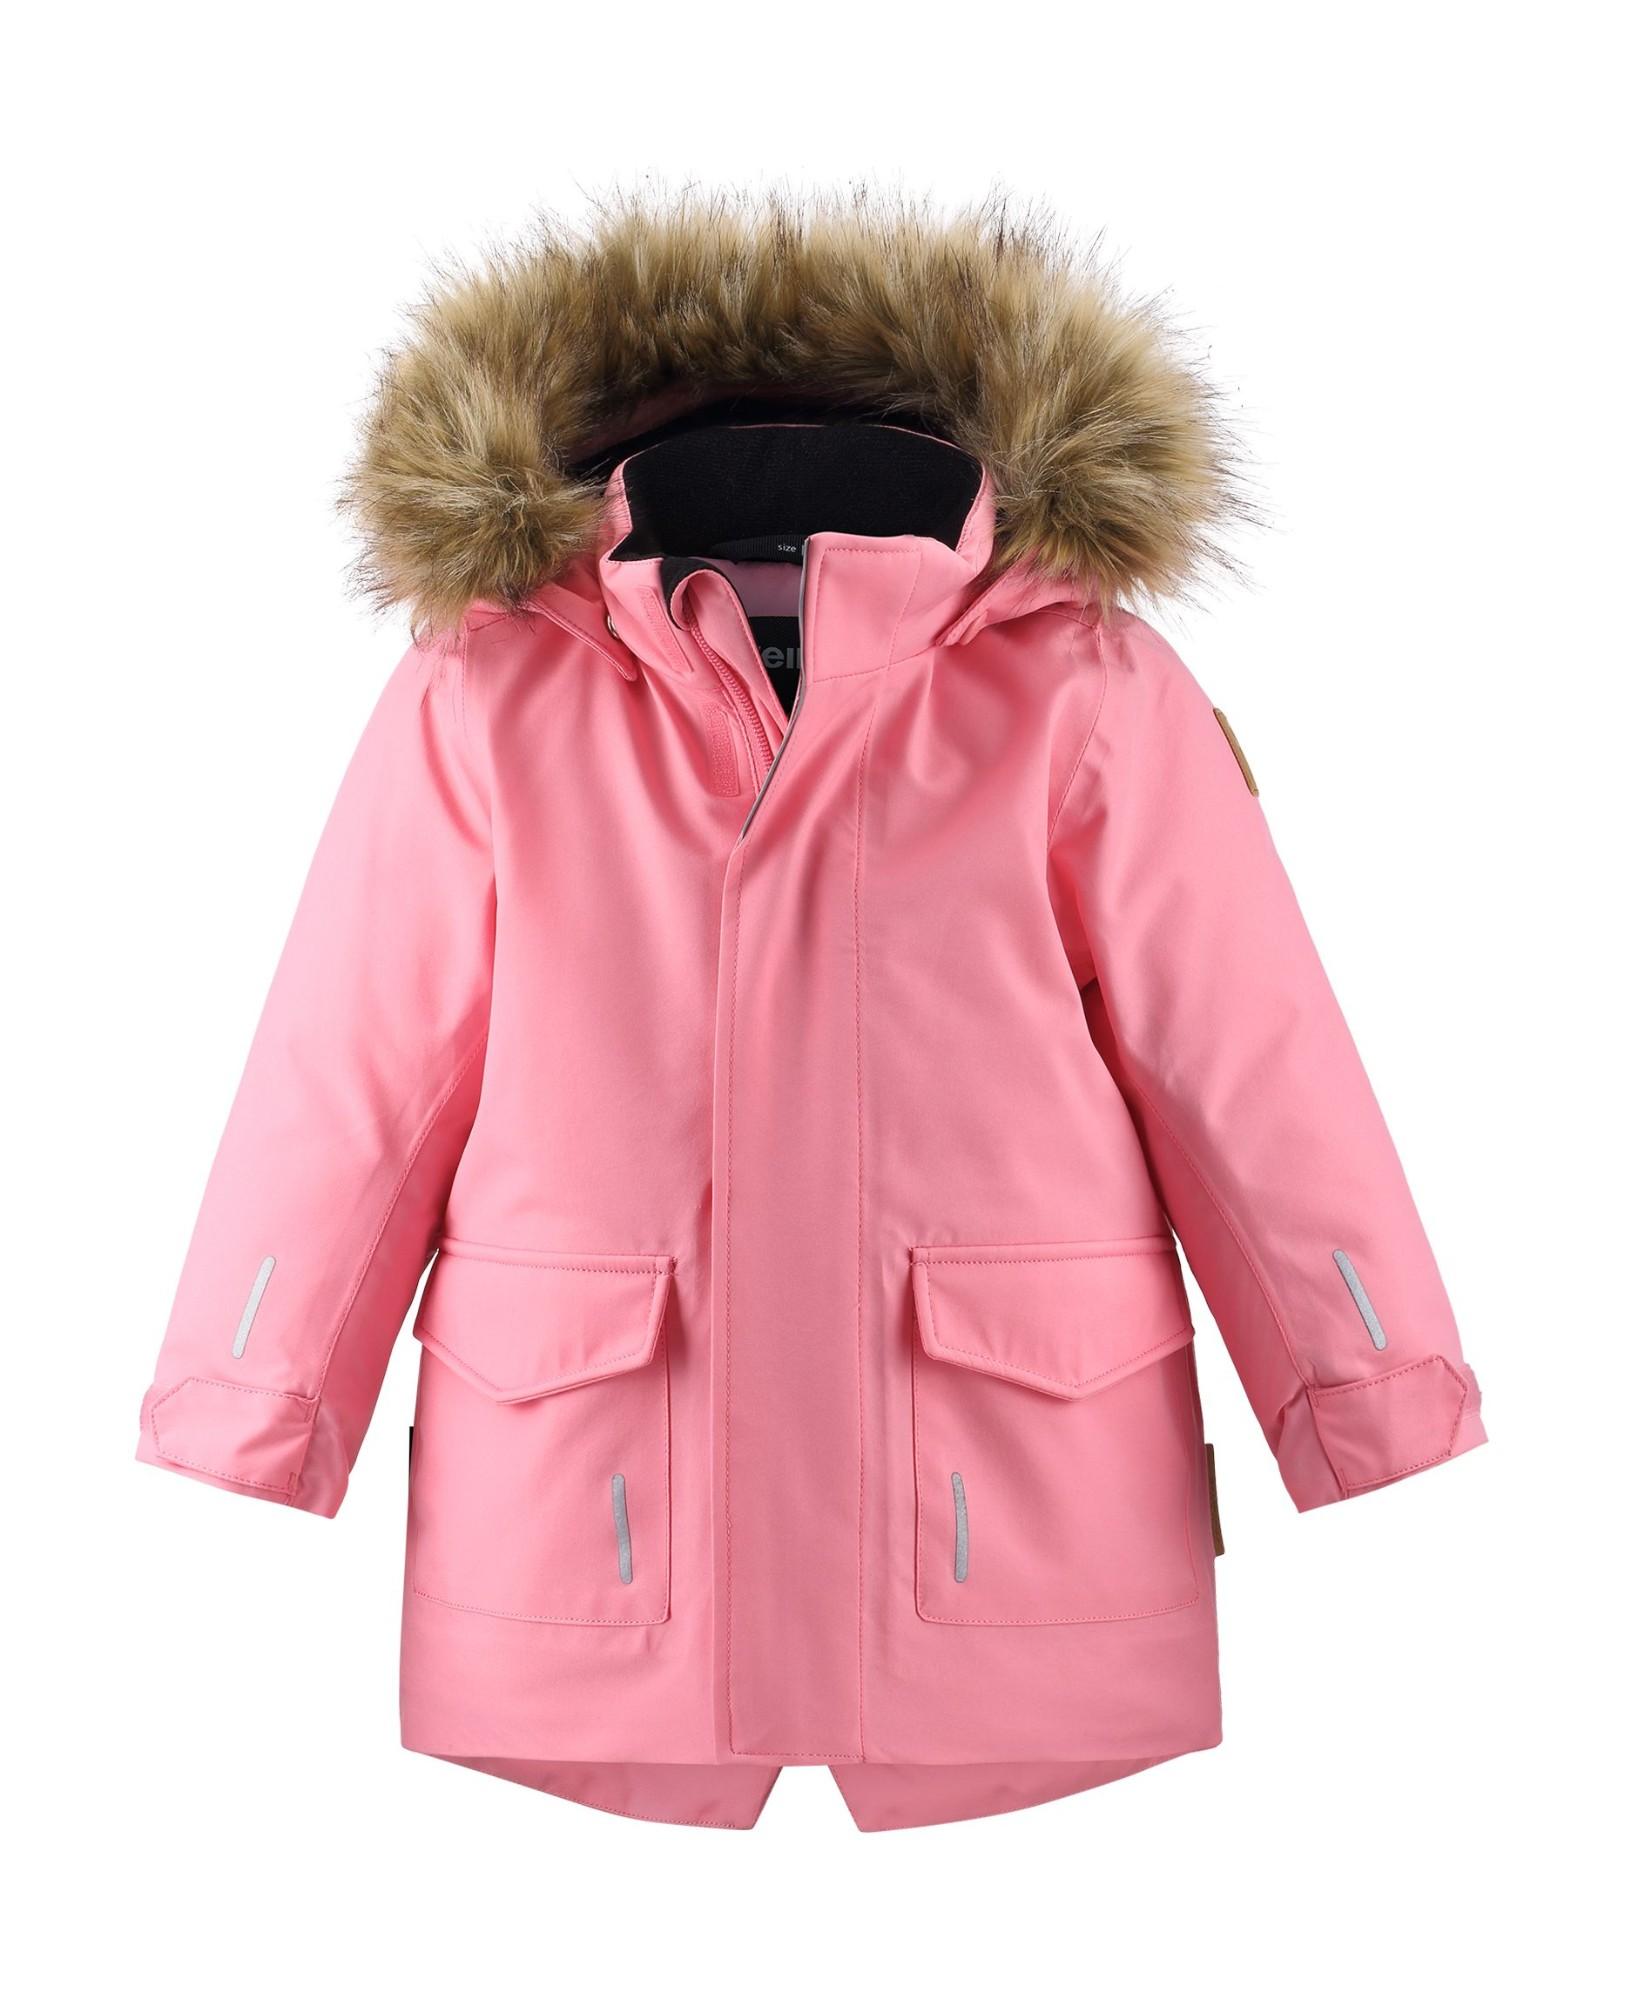 REIMA Mutka Bubblegum Pink 98